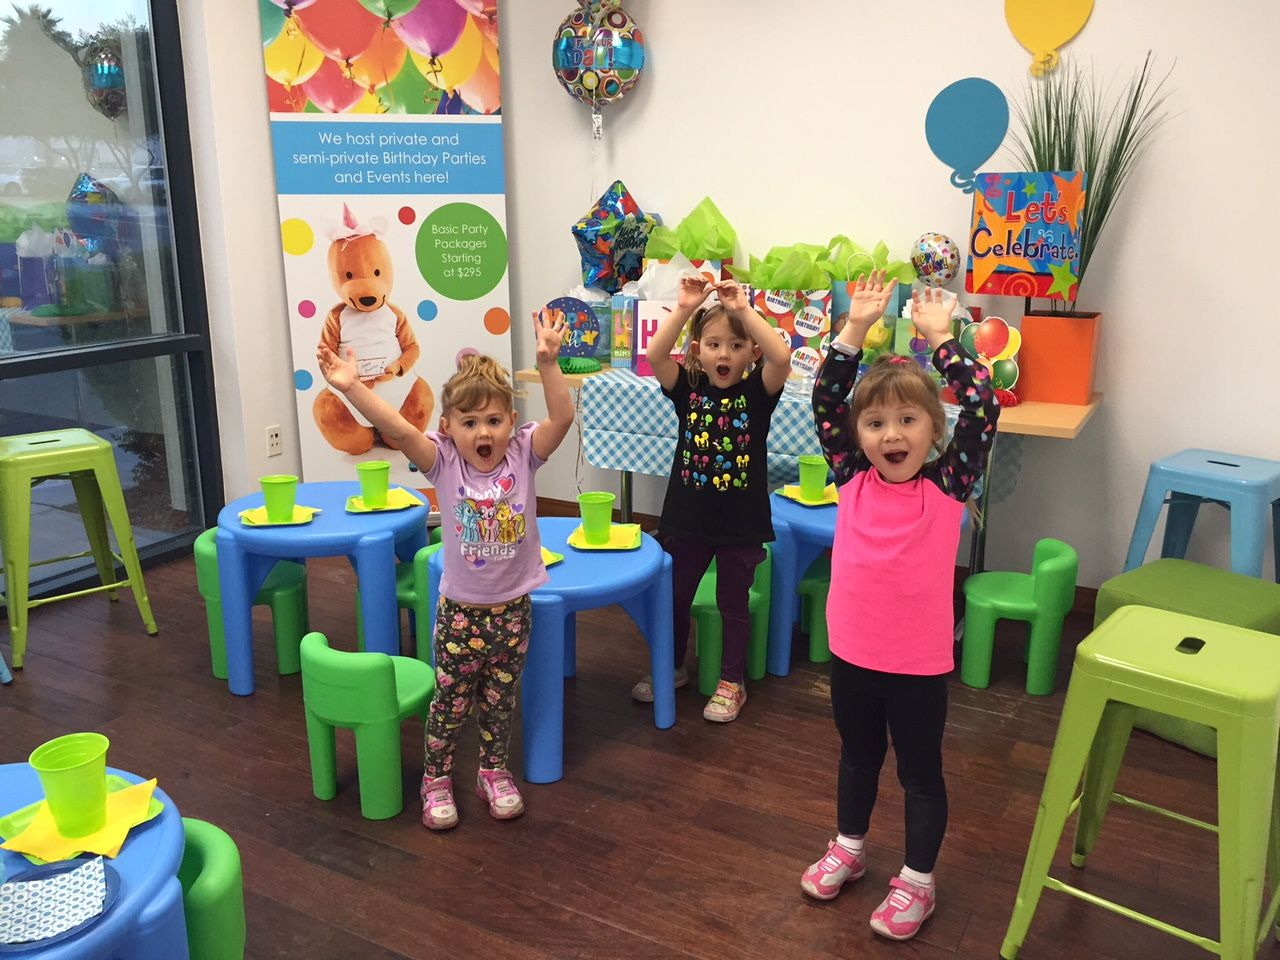 kangamoo indoor playground in las vegas birthday and